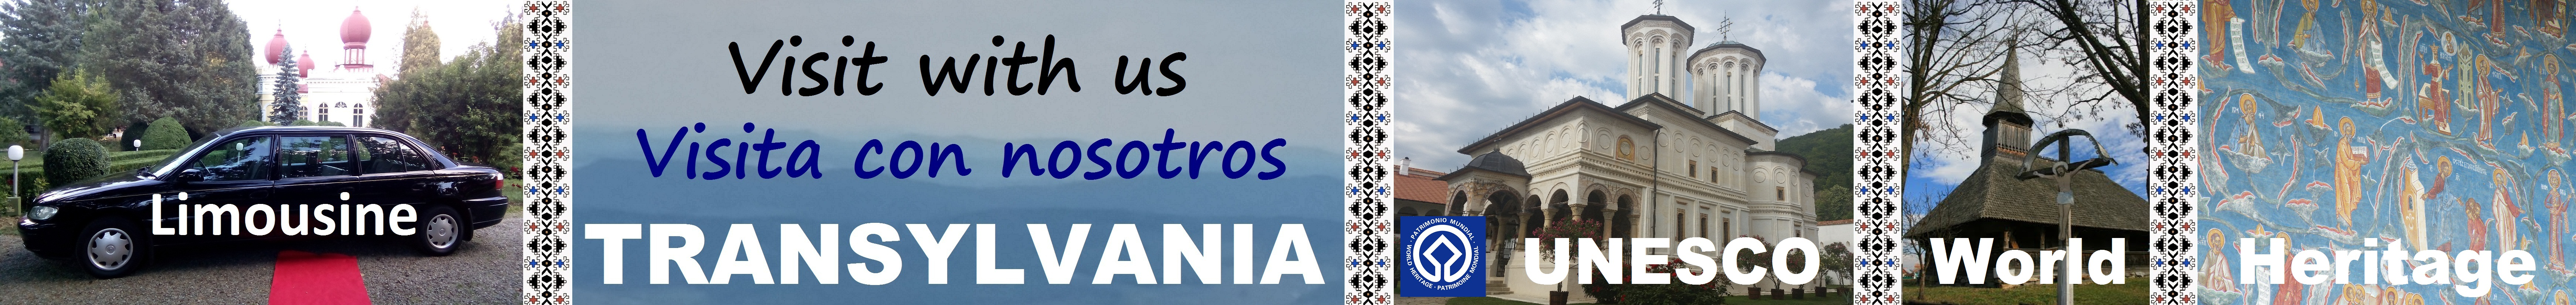 Travel Transylvania